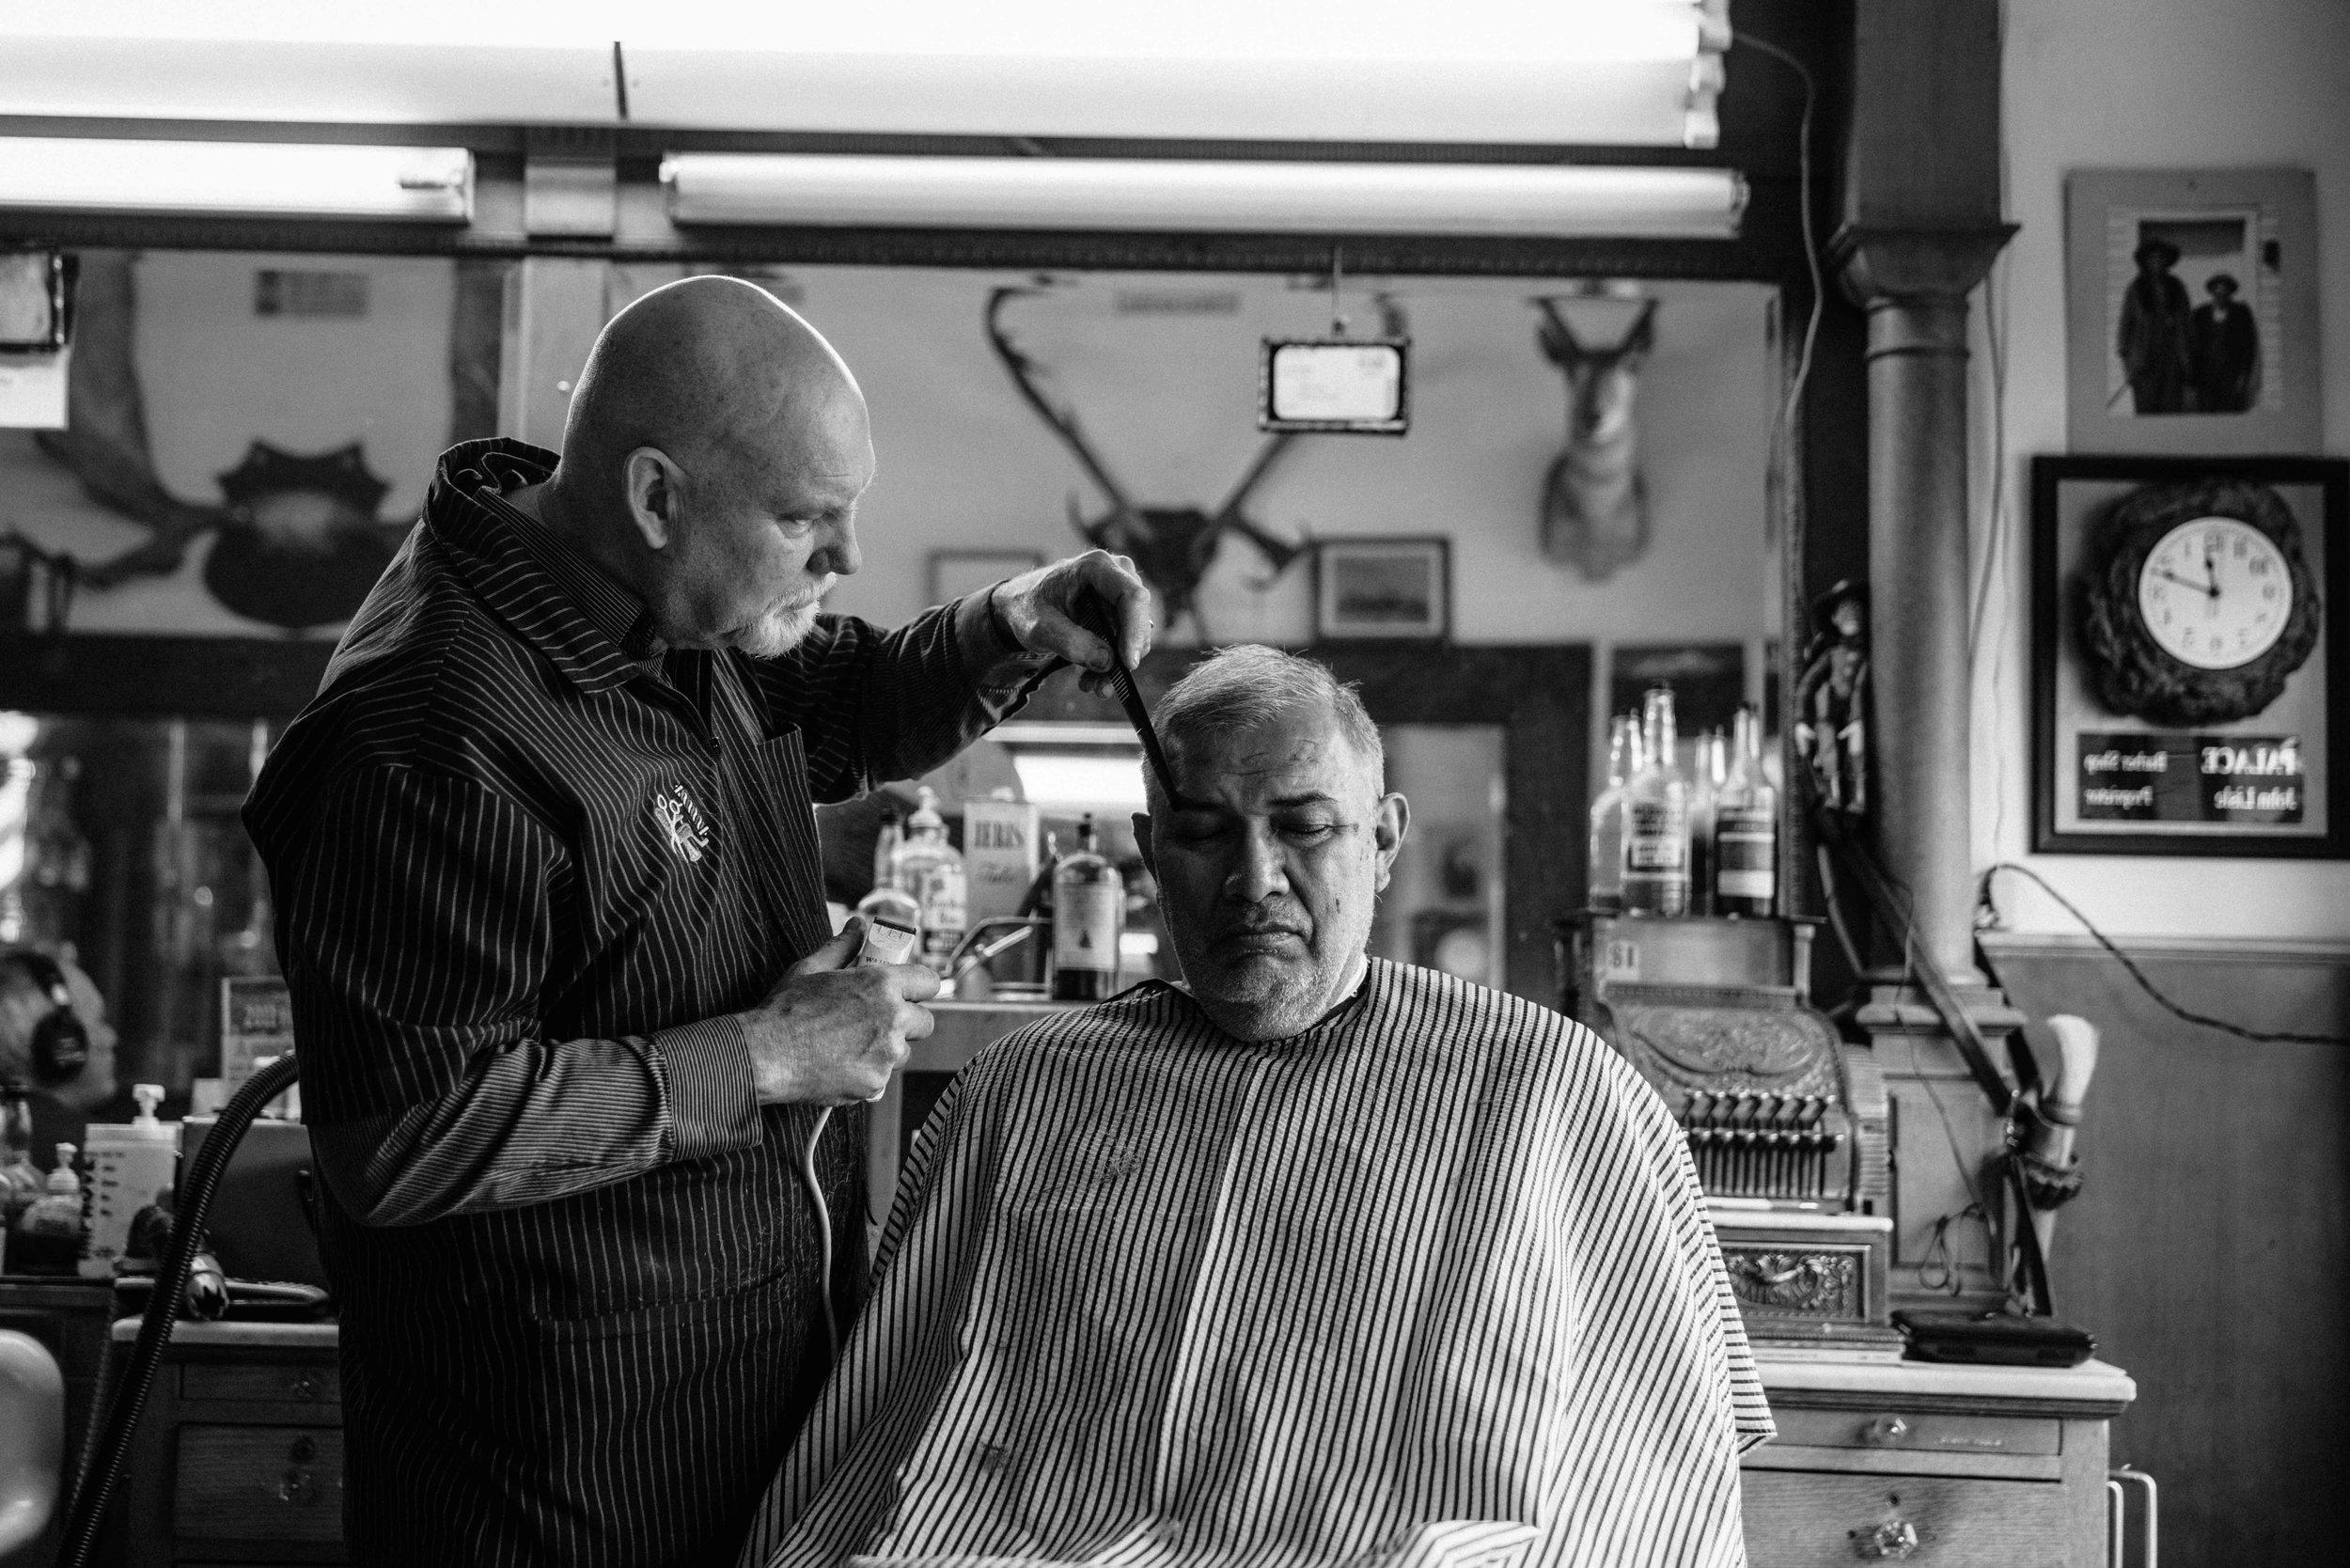 culture-crush-josue-rivas-state-of-jefferson-barber-shop.jpg